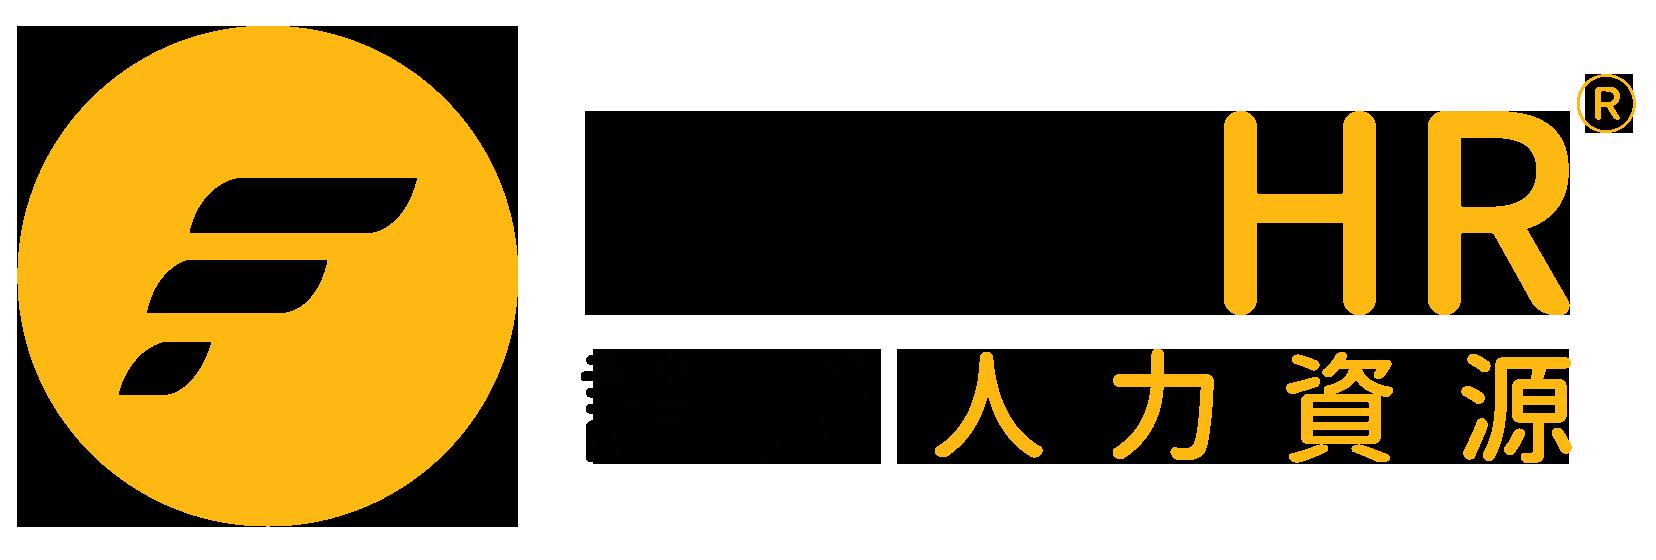 Flex Human Resources